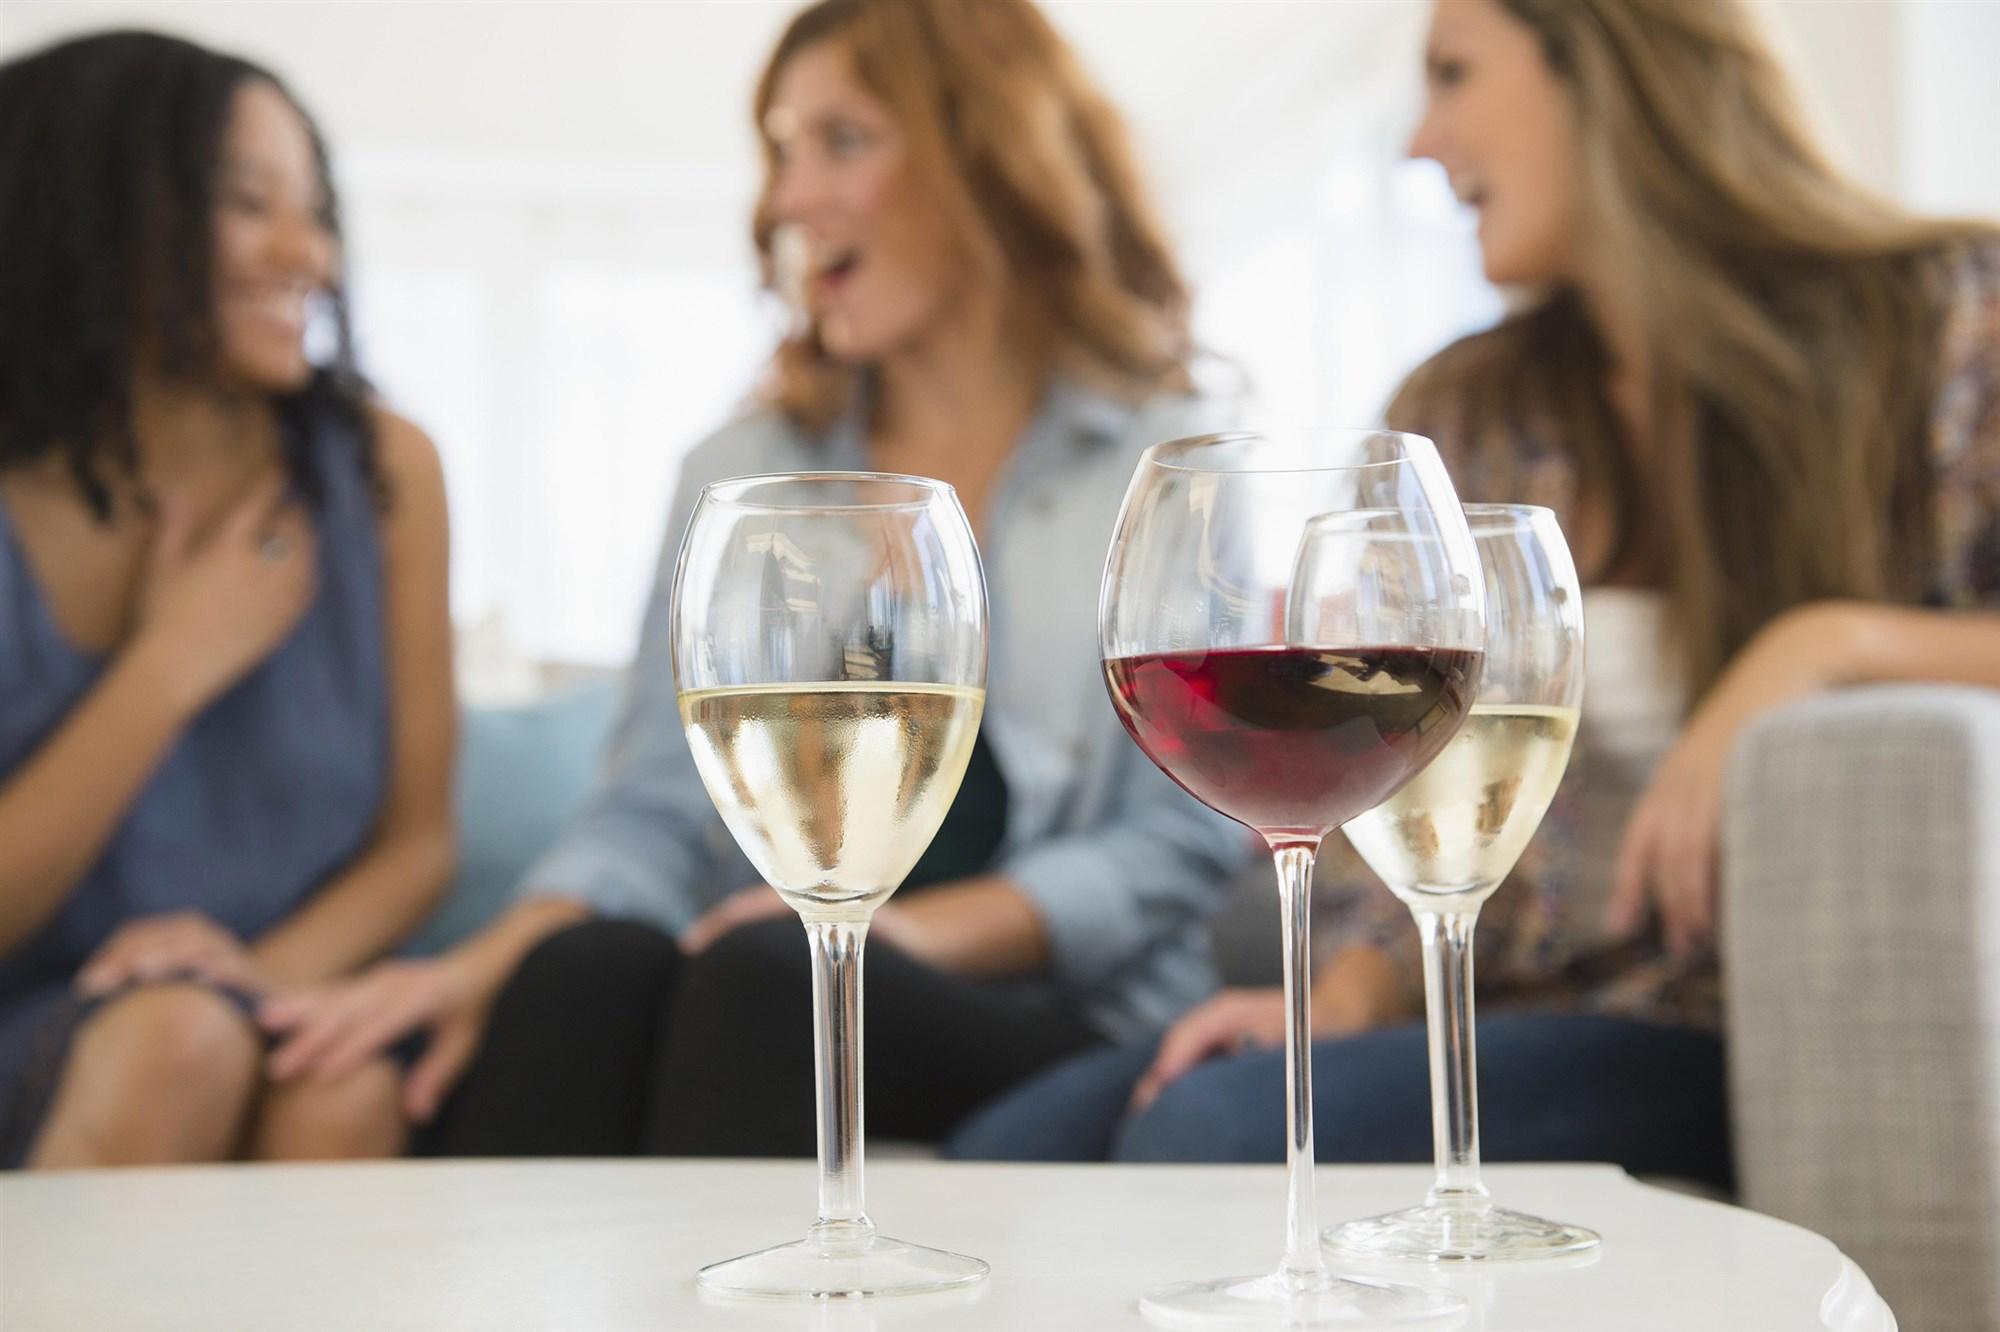 180105-women-drinking-wine-ew-630p_f0eb0b17db2bfd7e11391cd02ff5145b.fit-2000w.jpg